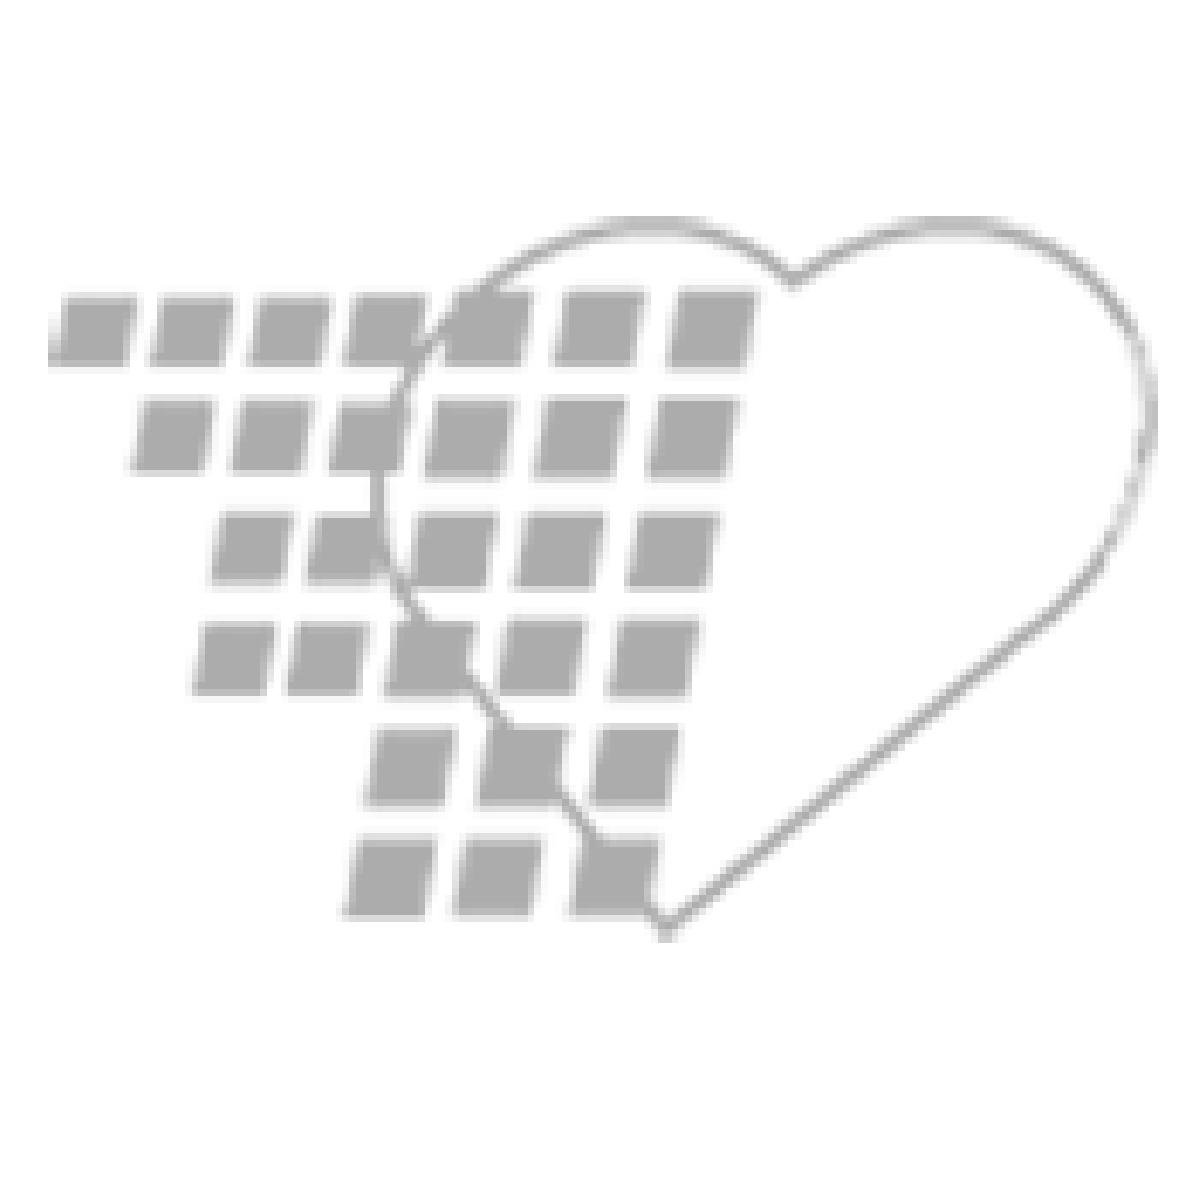 04-71-1008 - Amico Teaching Mobile Vertical Headwall - Semi Private